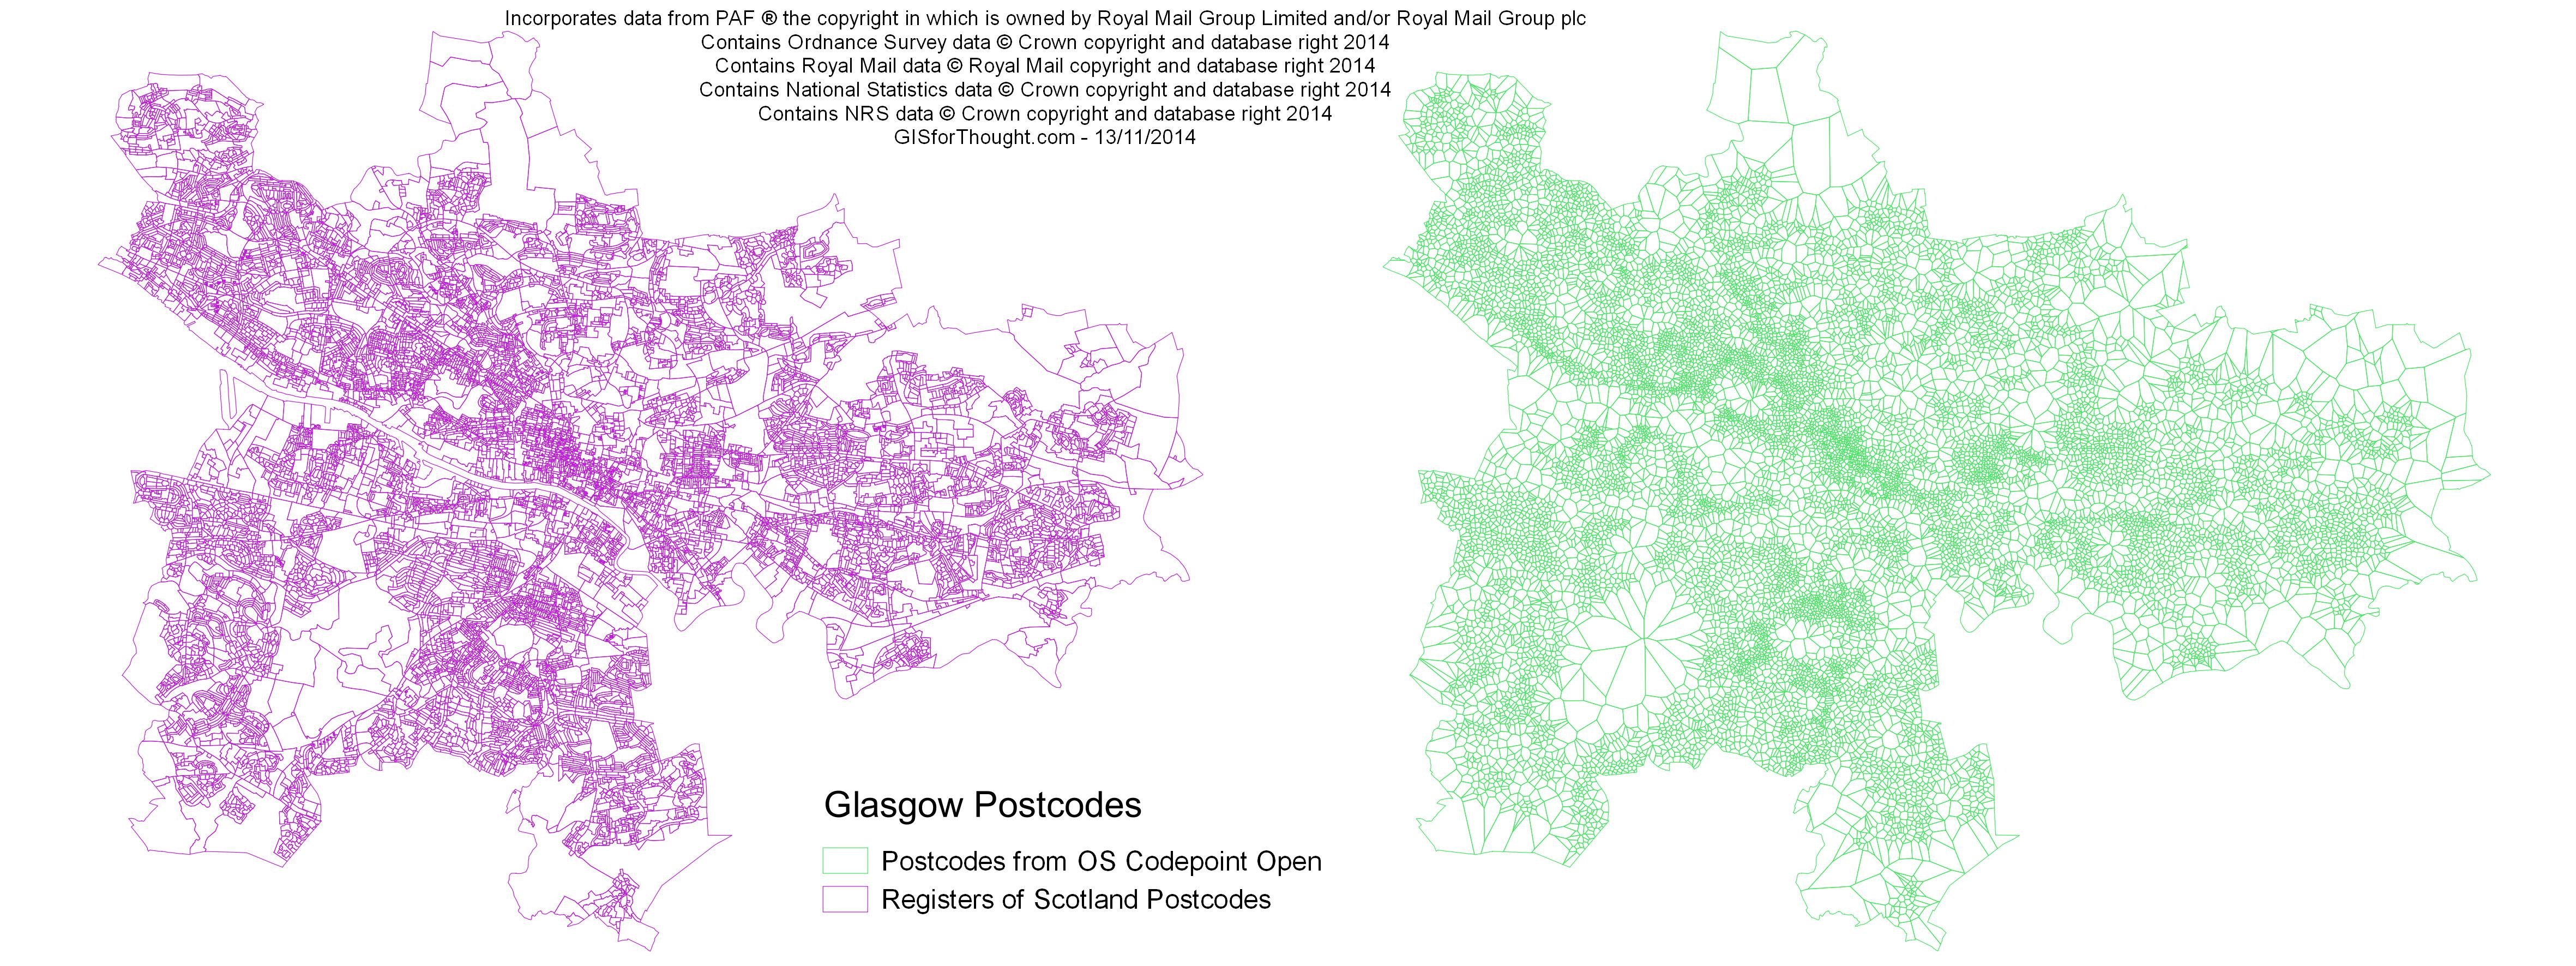 Glasgow Postcodes